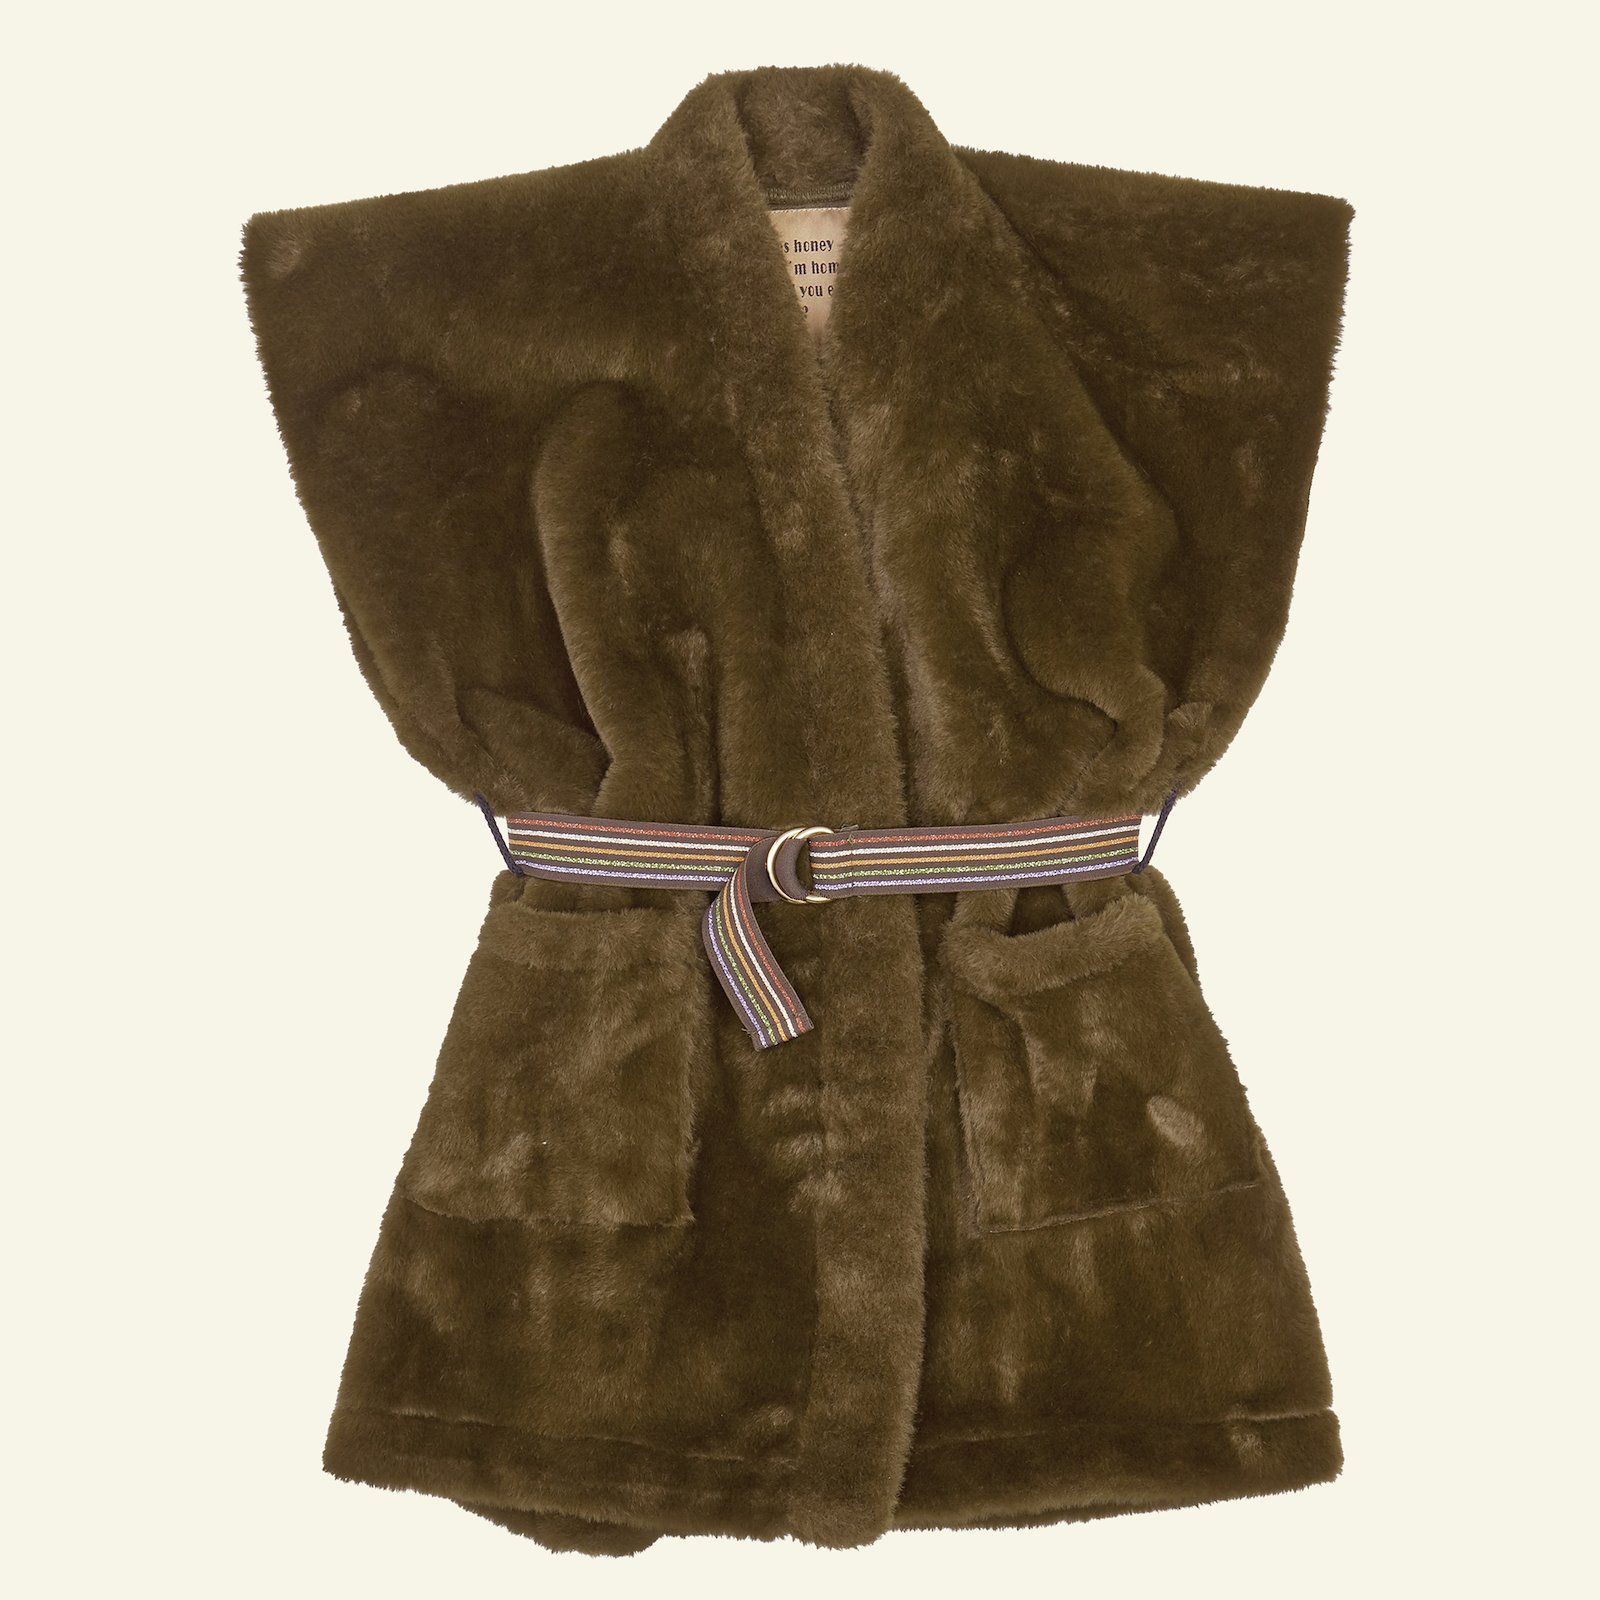 Kimono and tunika, 104/4y p63057_910276_21416_45519_sskit